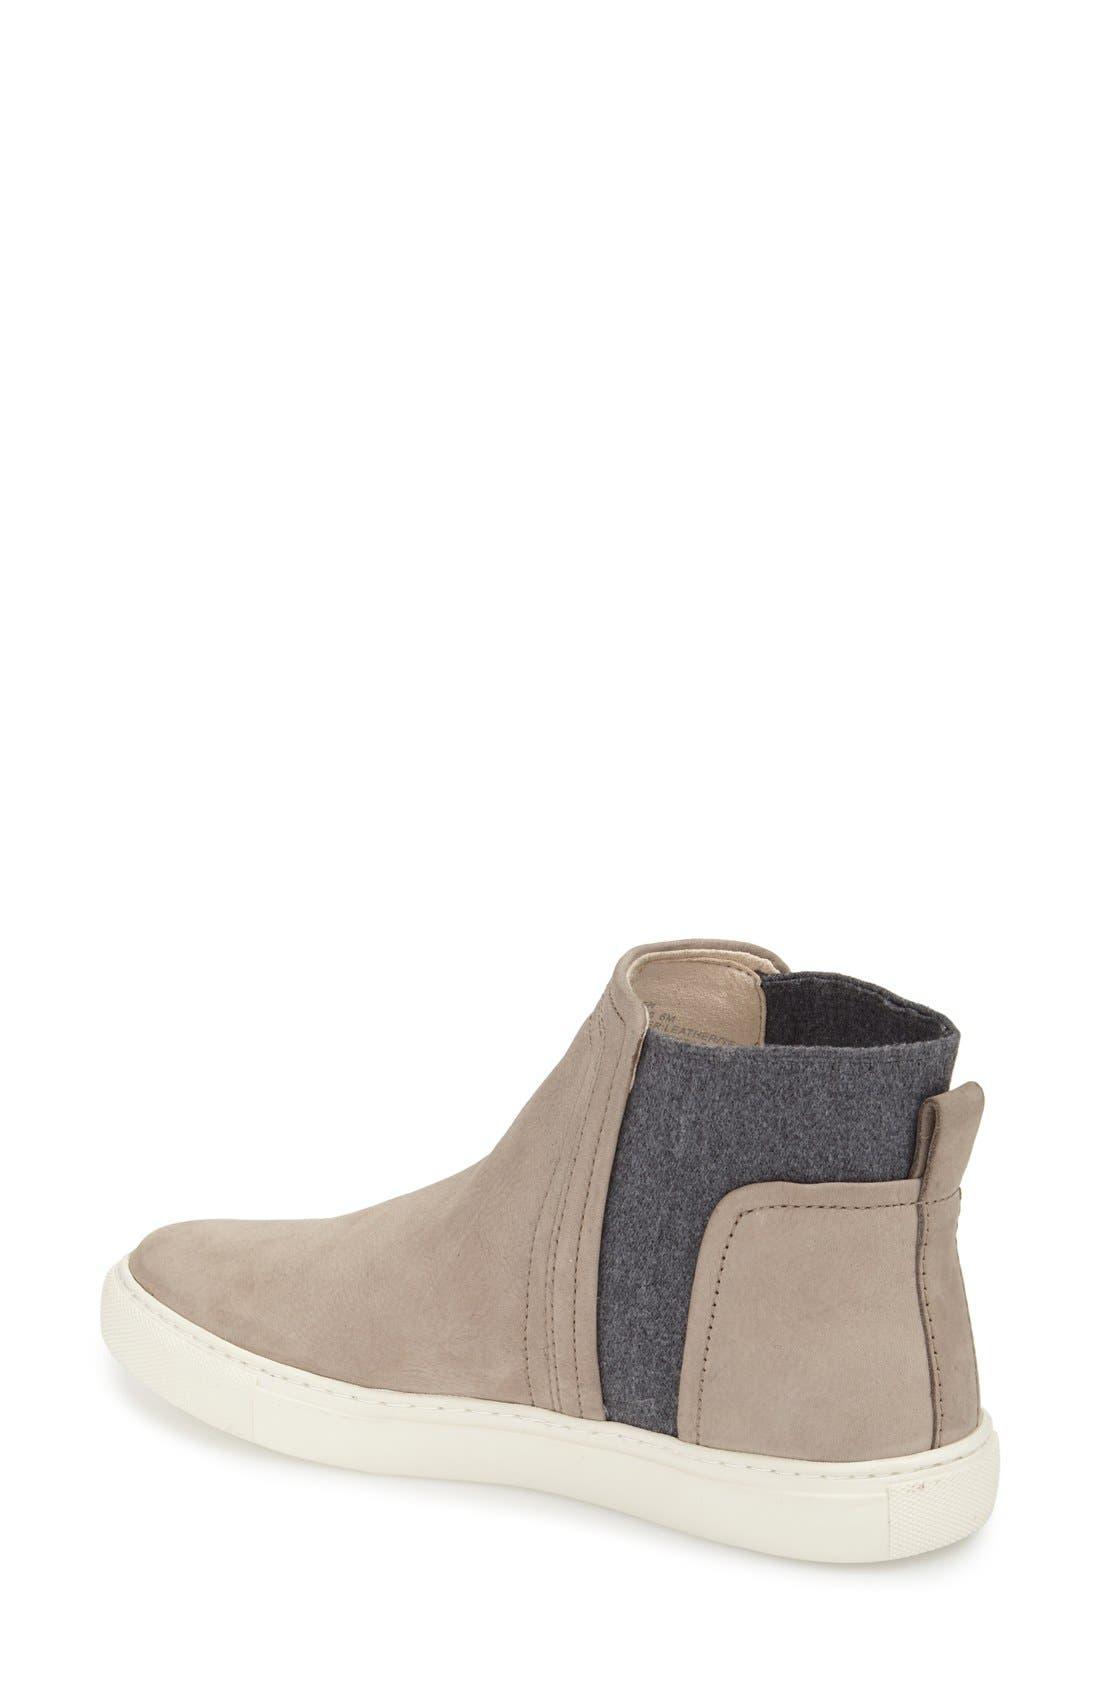 Alternate Image 2  - Kenneth Cole New York 'Ken' Leather Slip-On Sneaker (Women)